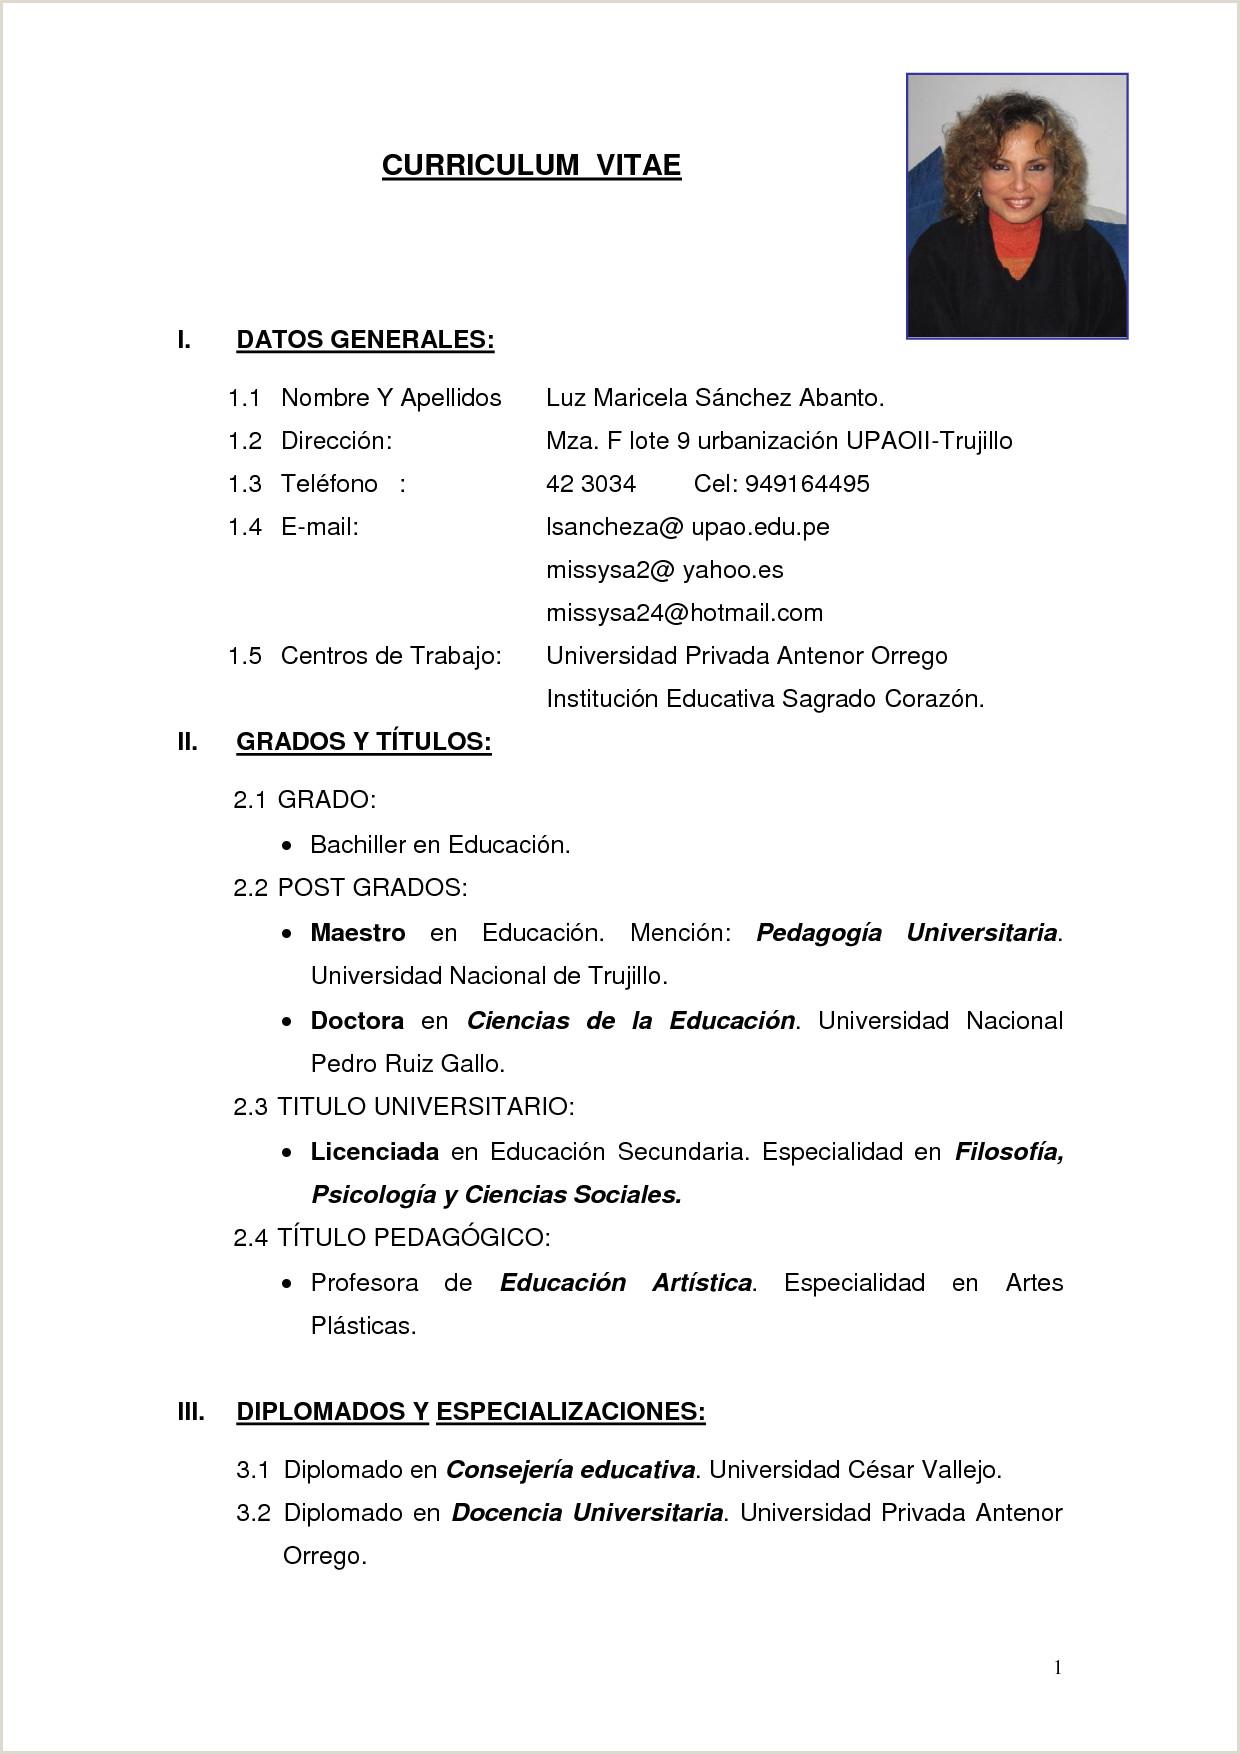 Llenar Curriculum Vitae formato Word Para Rellenar Gratis Resultado De Imagen Para Curriculum Simple Fg